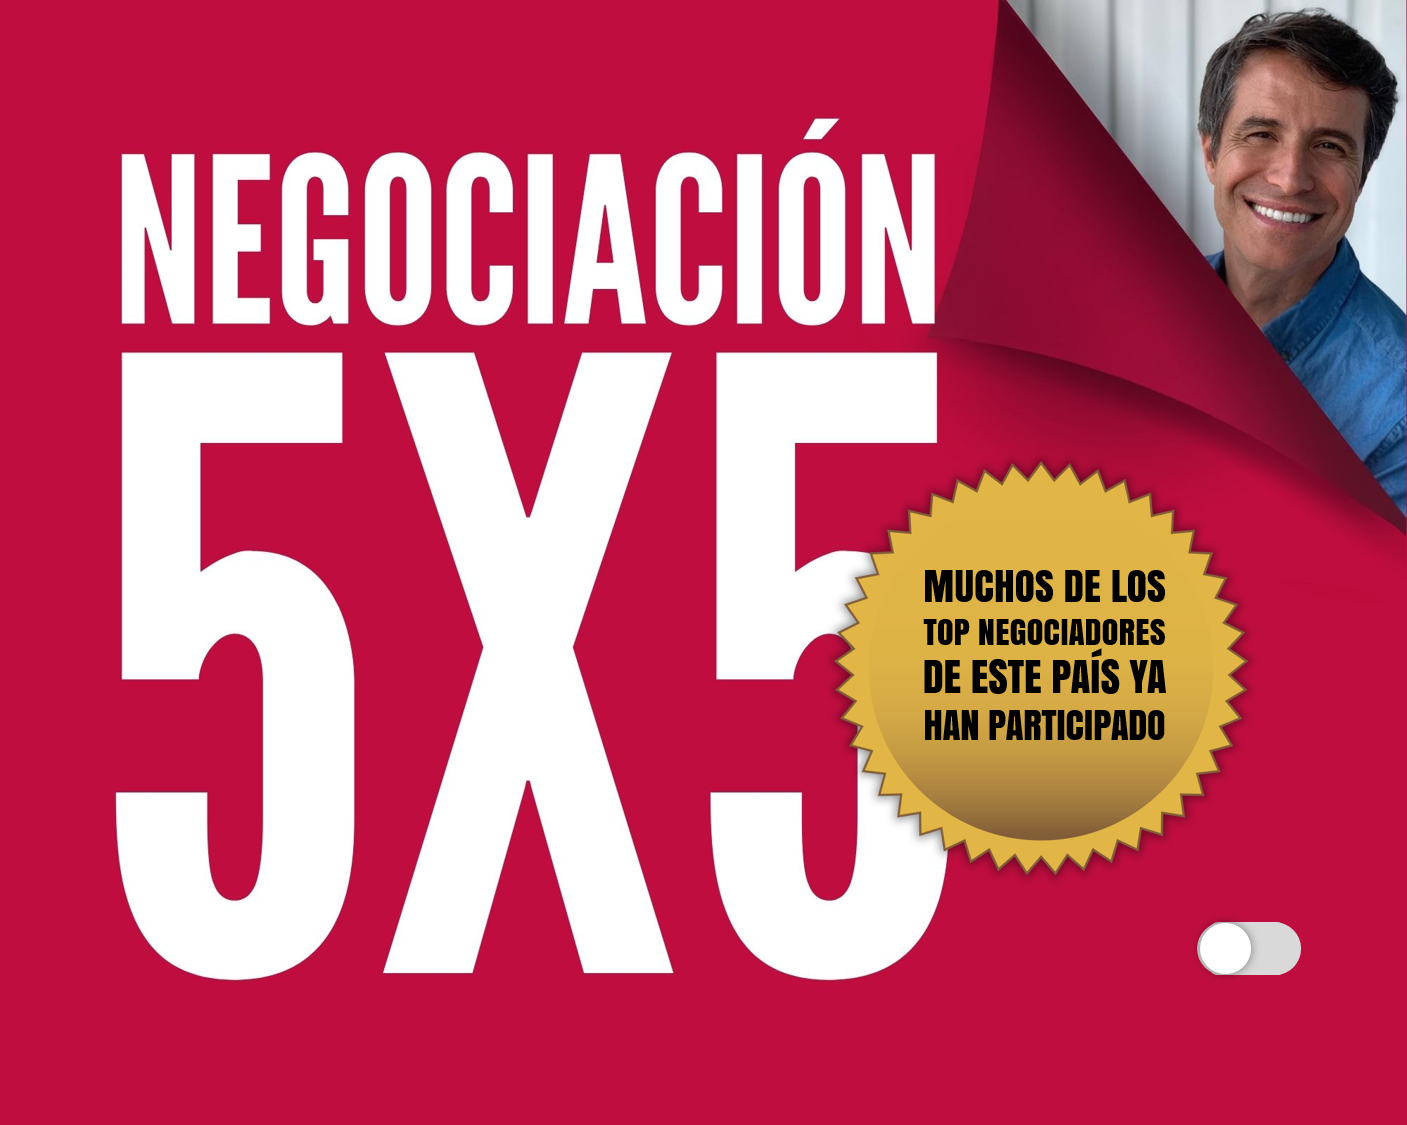 negociacin-5×5-2021